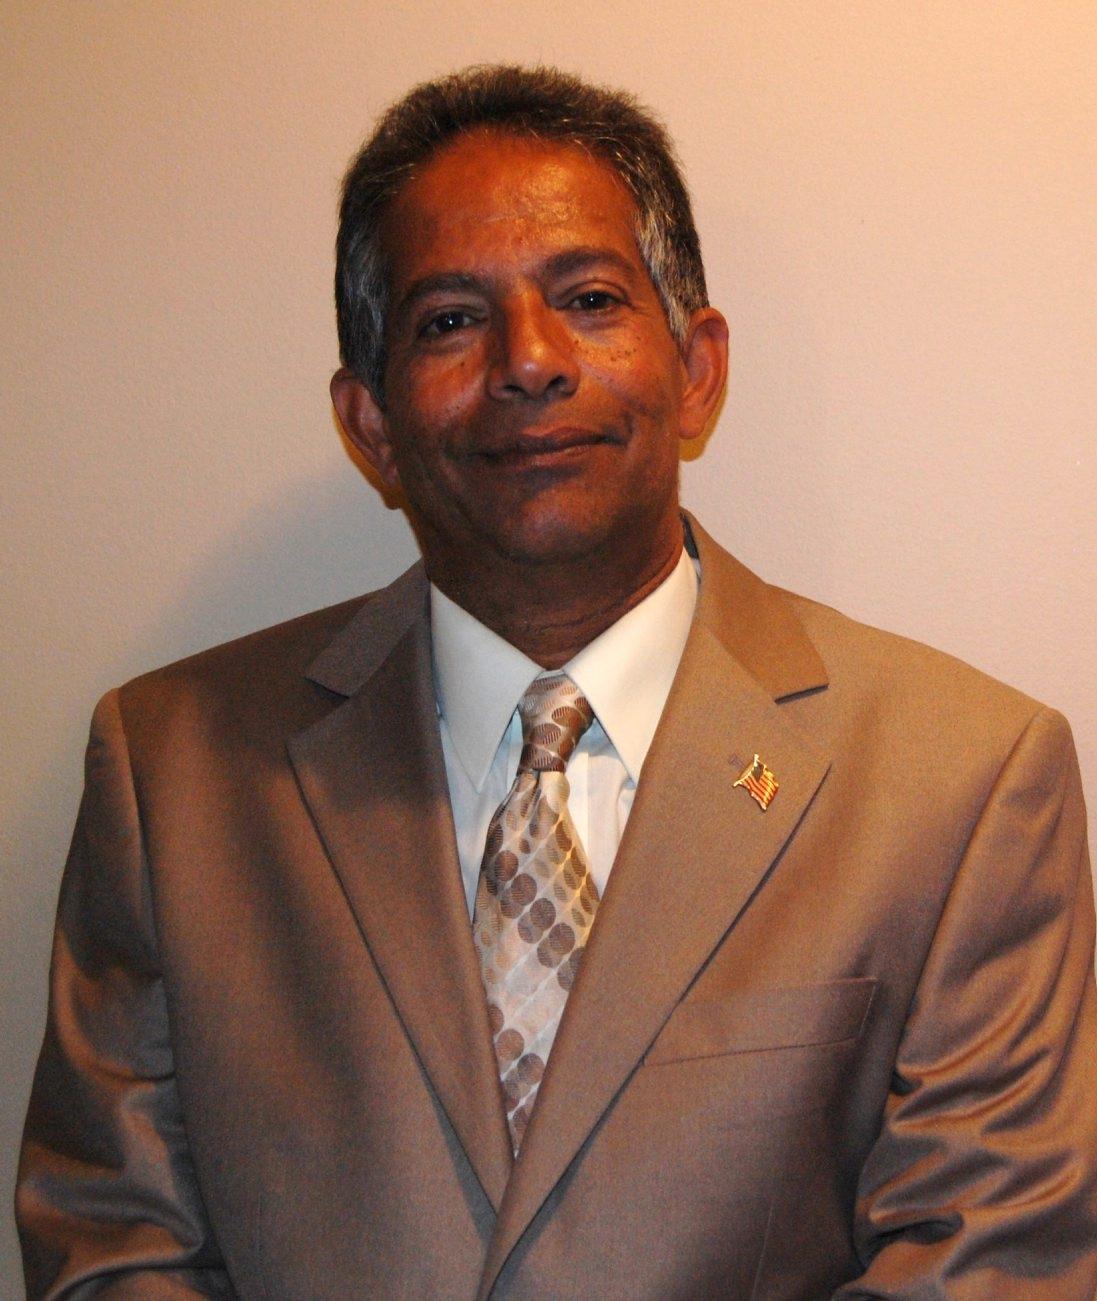 Abdulsalam K. Noman, candidate for Lackawanna 1st Ward Council election.